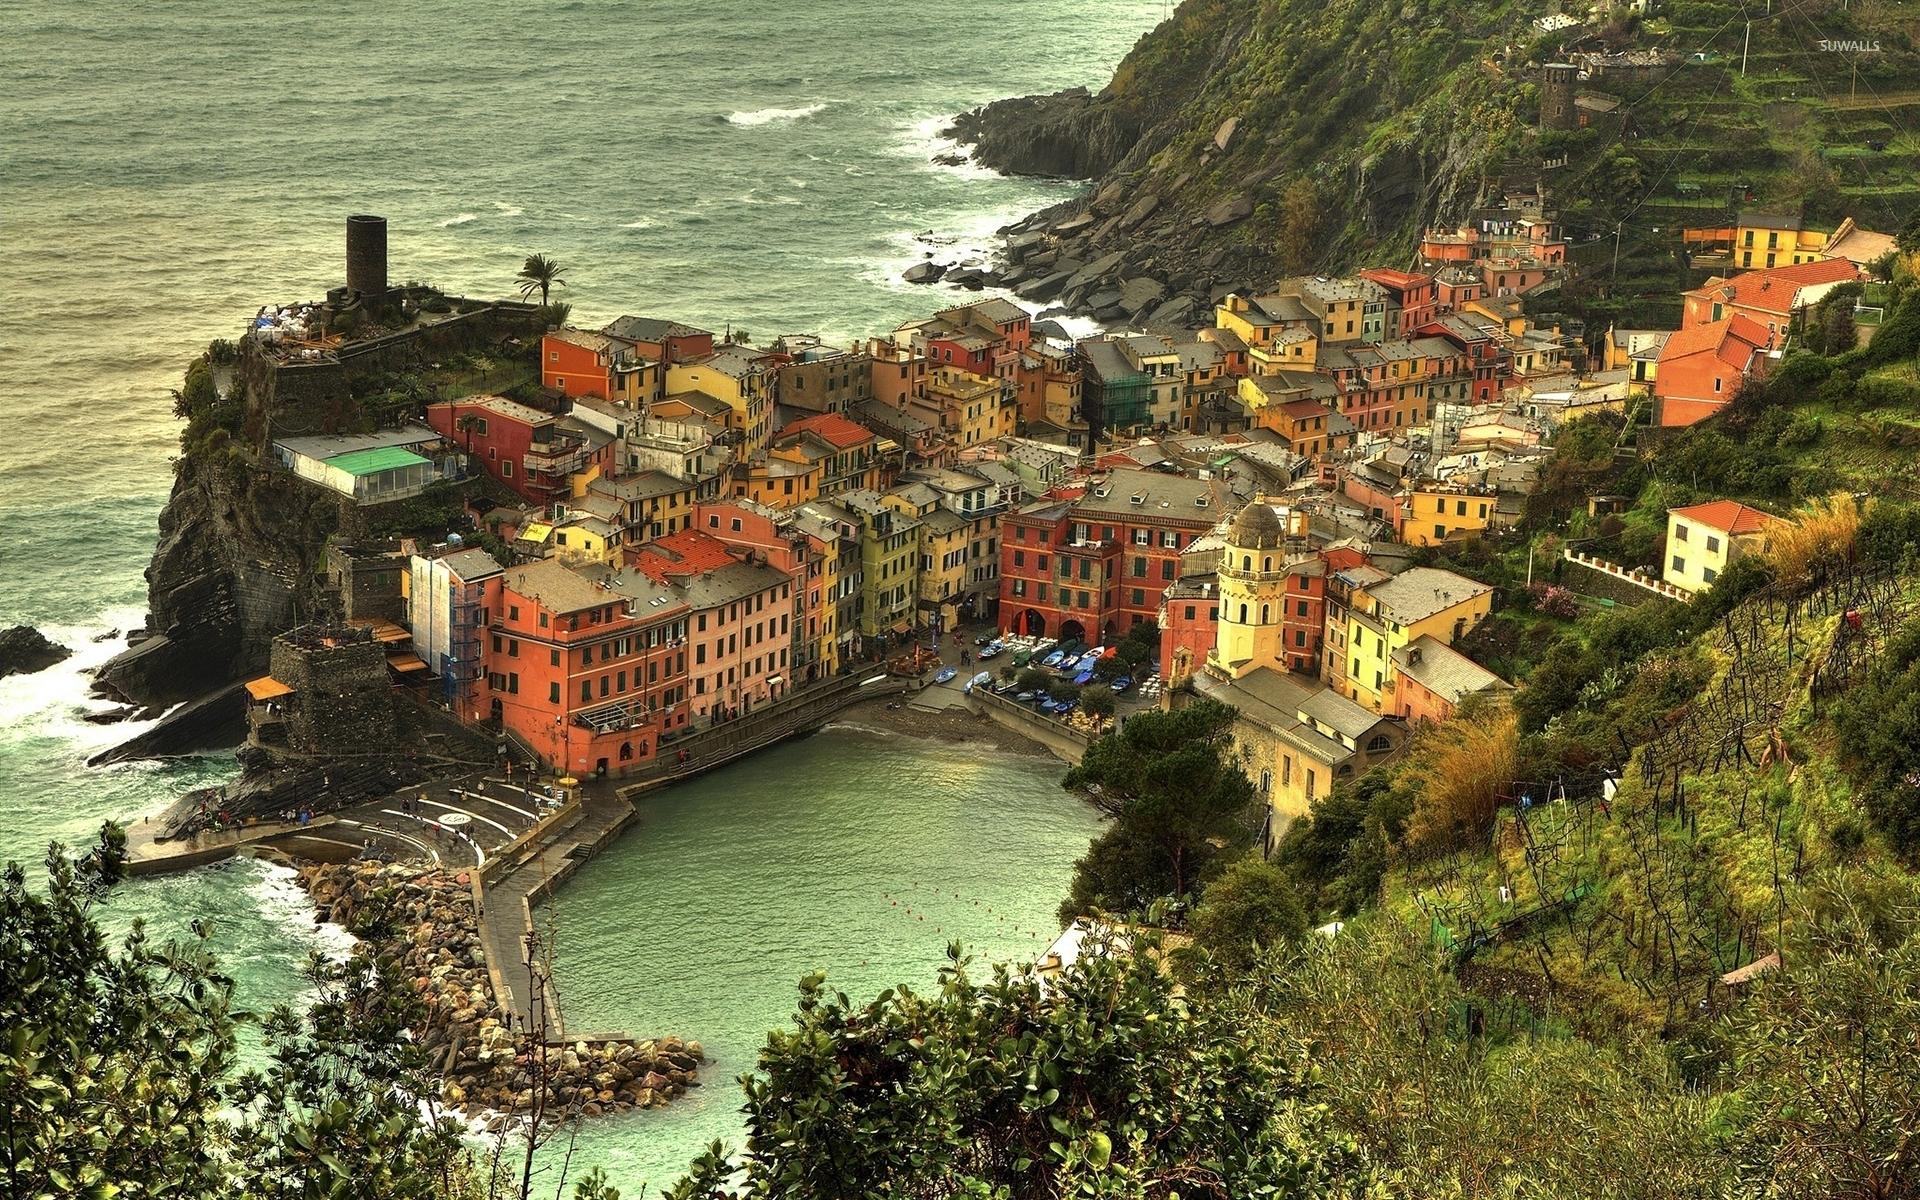 Cinque Terre on Italian Riviera coastline wallpaper